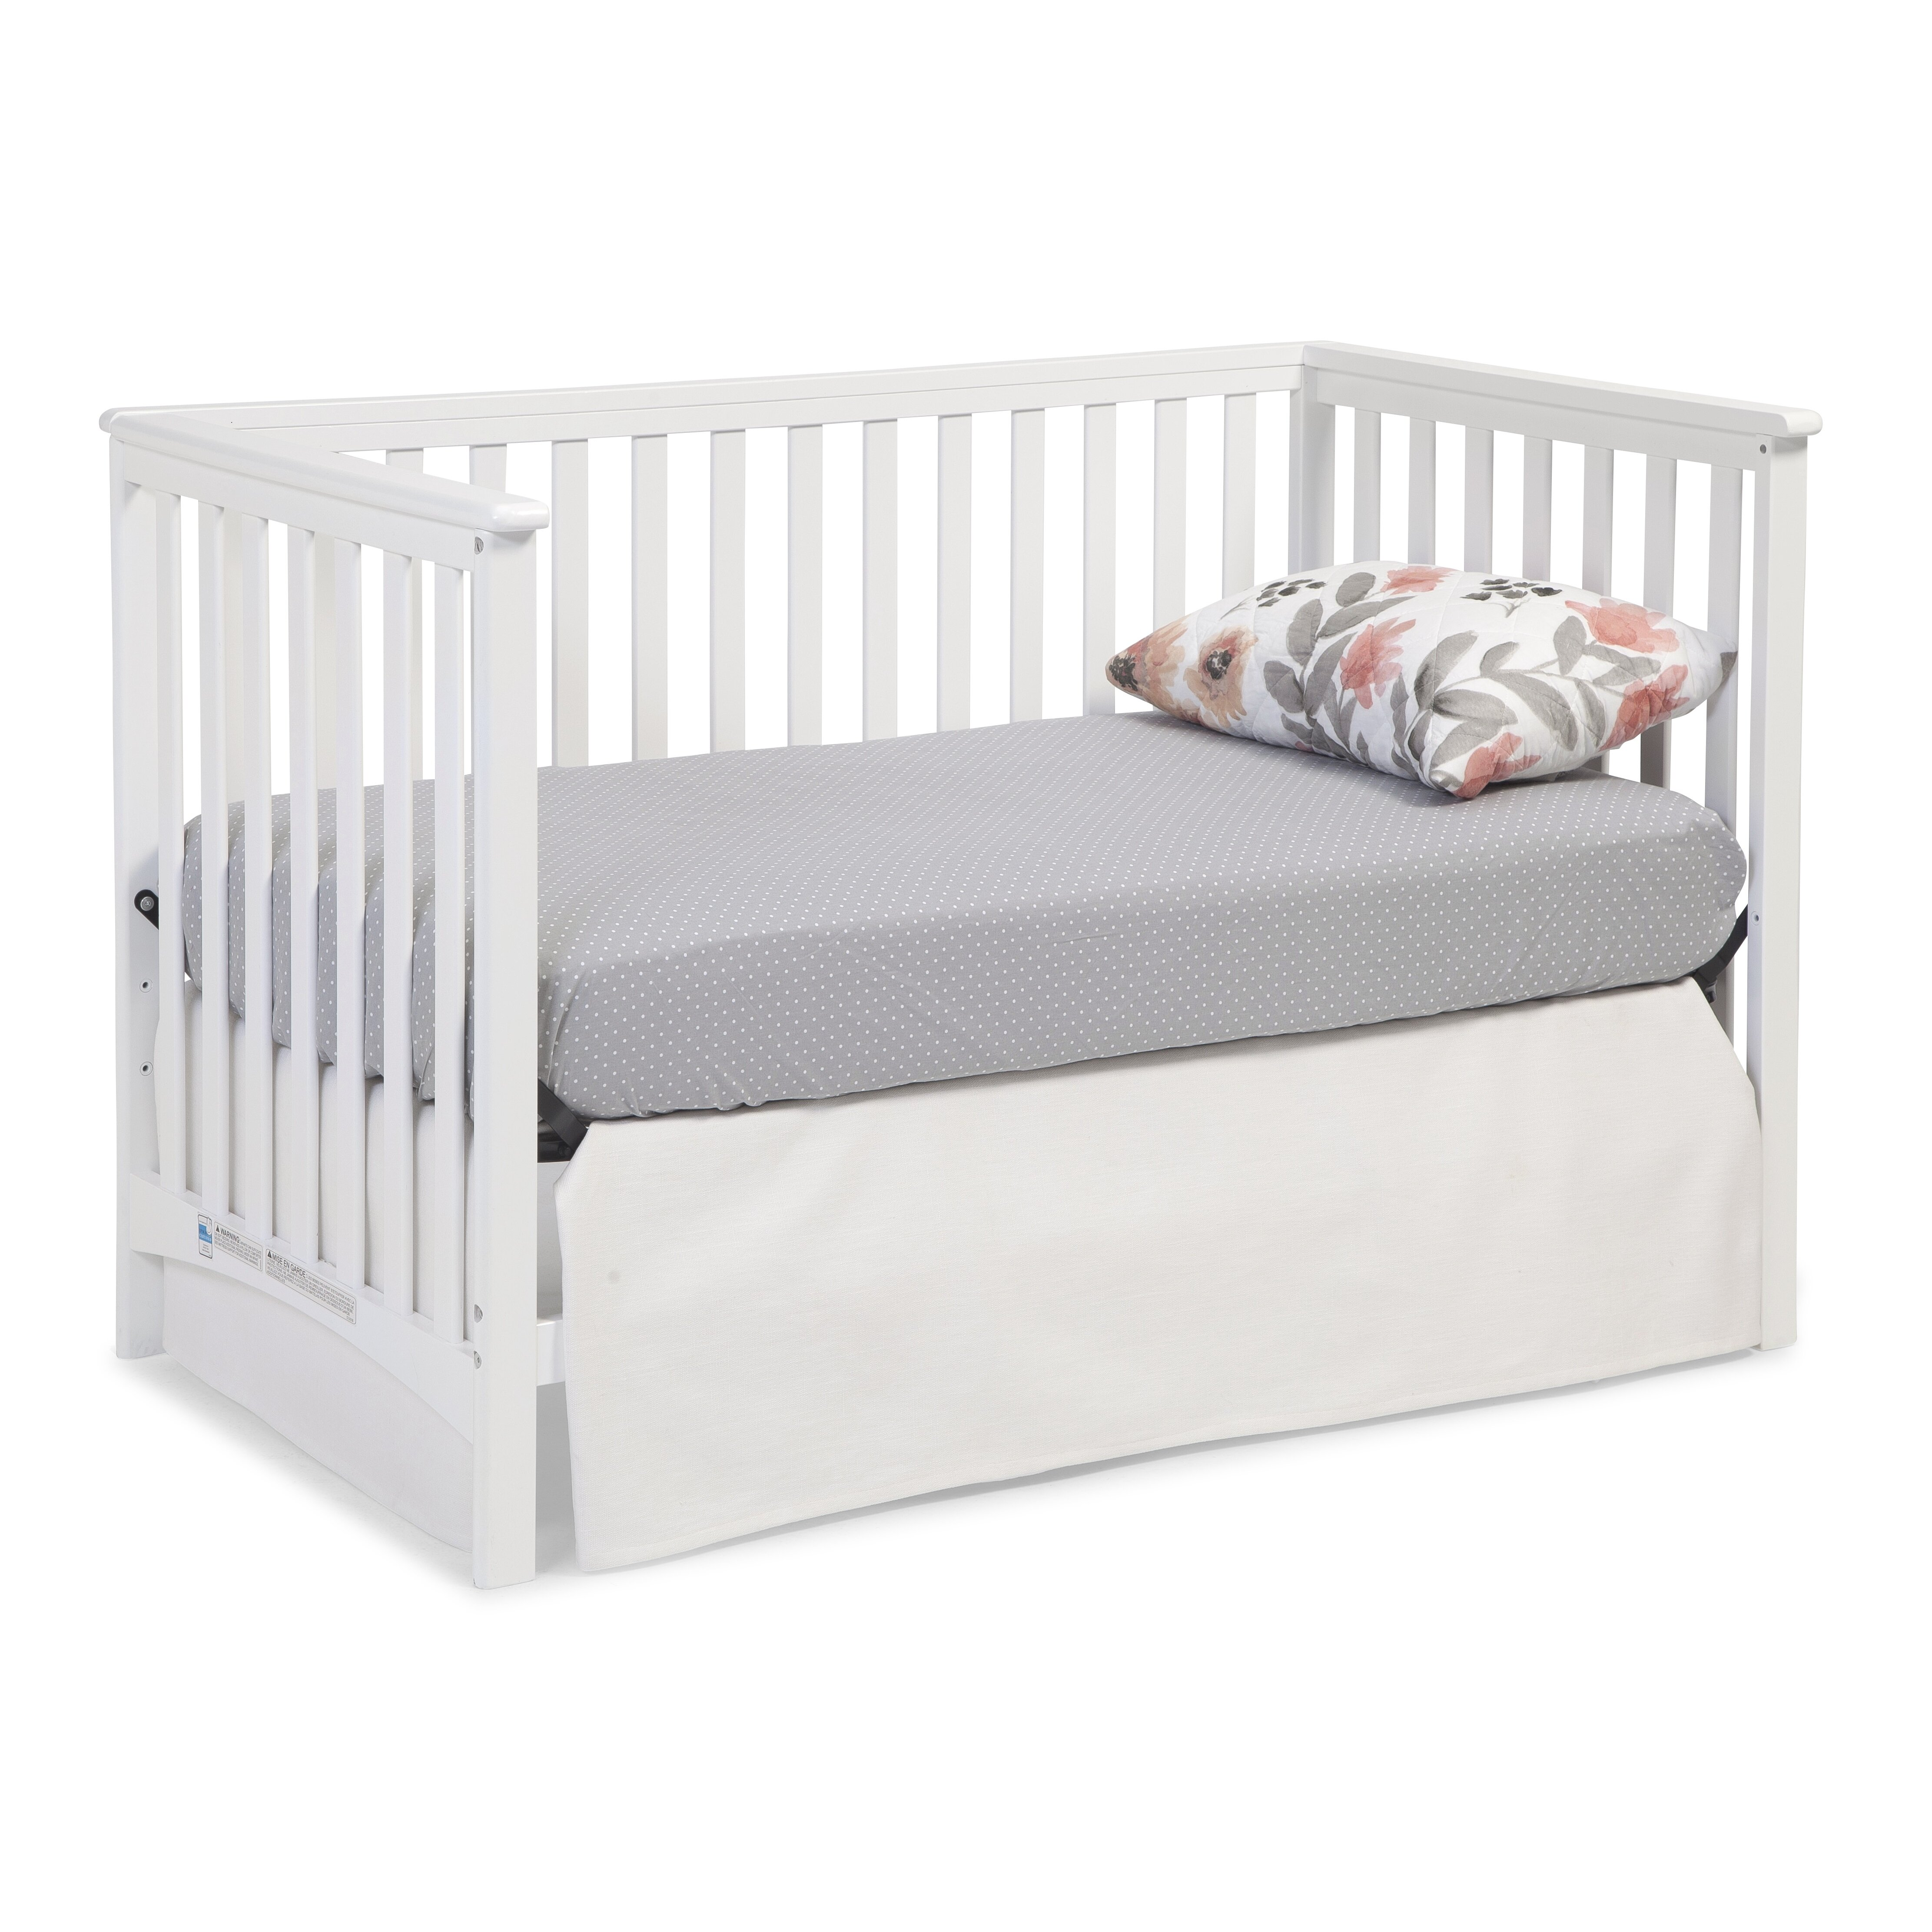 Crib spring frame for sale - Storkcraft Hillcrest 3 In 1 Convertible Crib